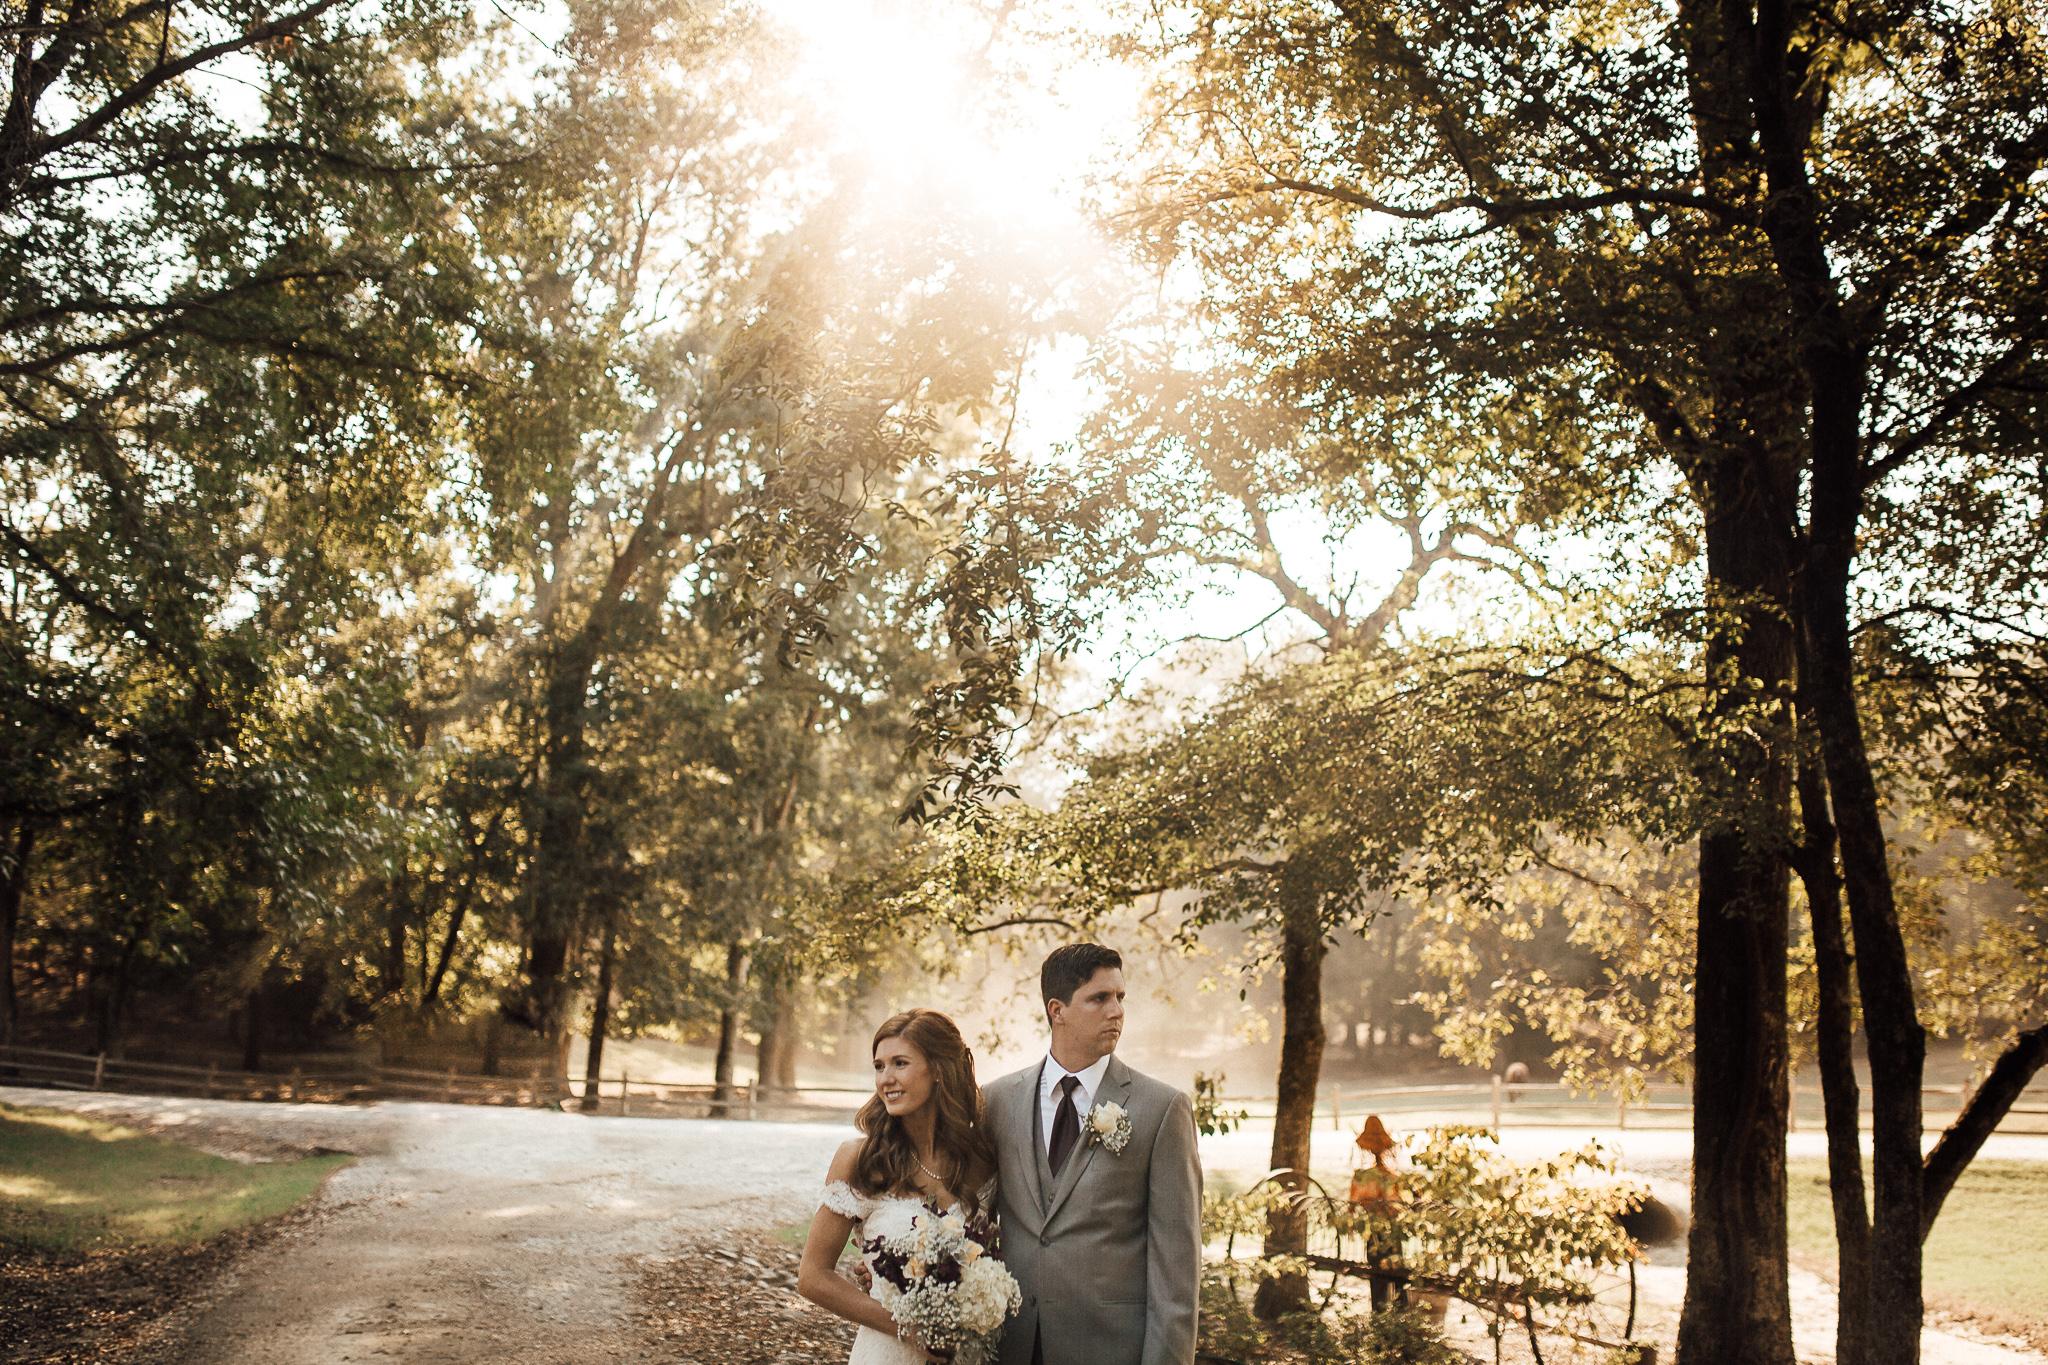 memphis-wedding-photographer-chattanooga-wedding-photographer-cassie-cook-photography